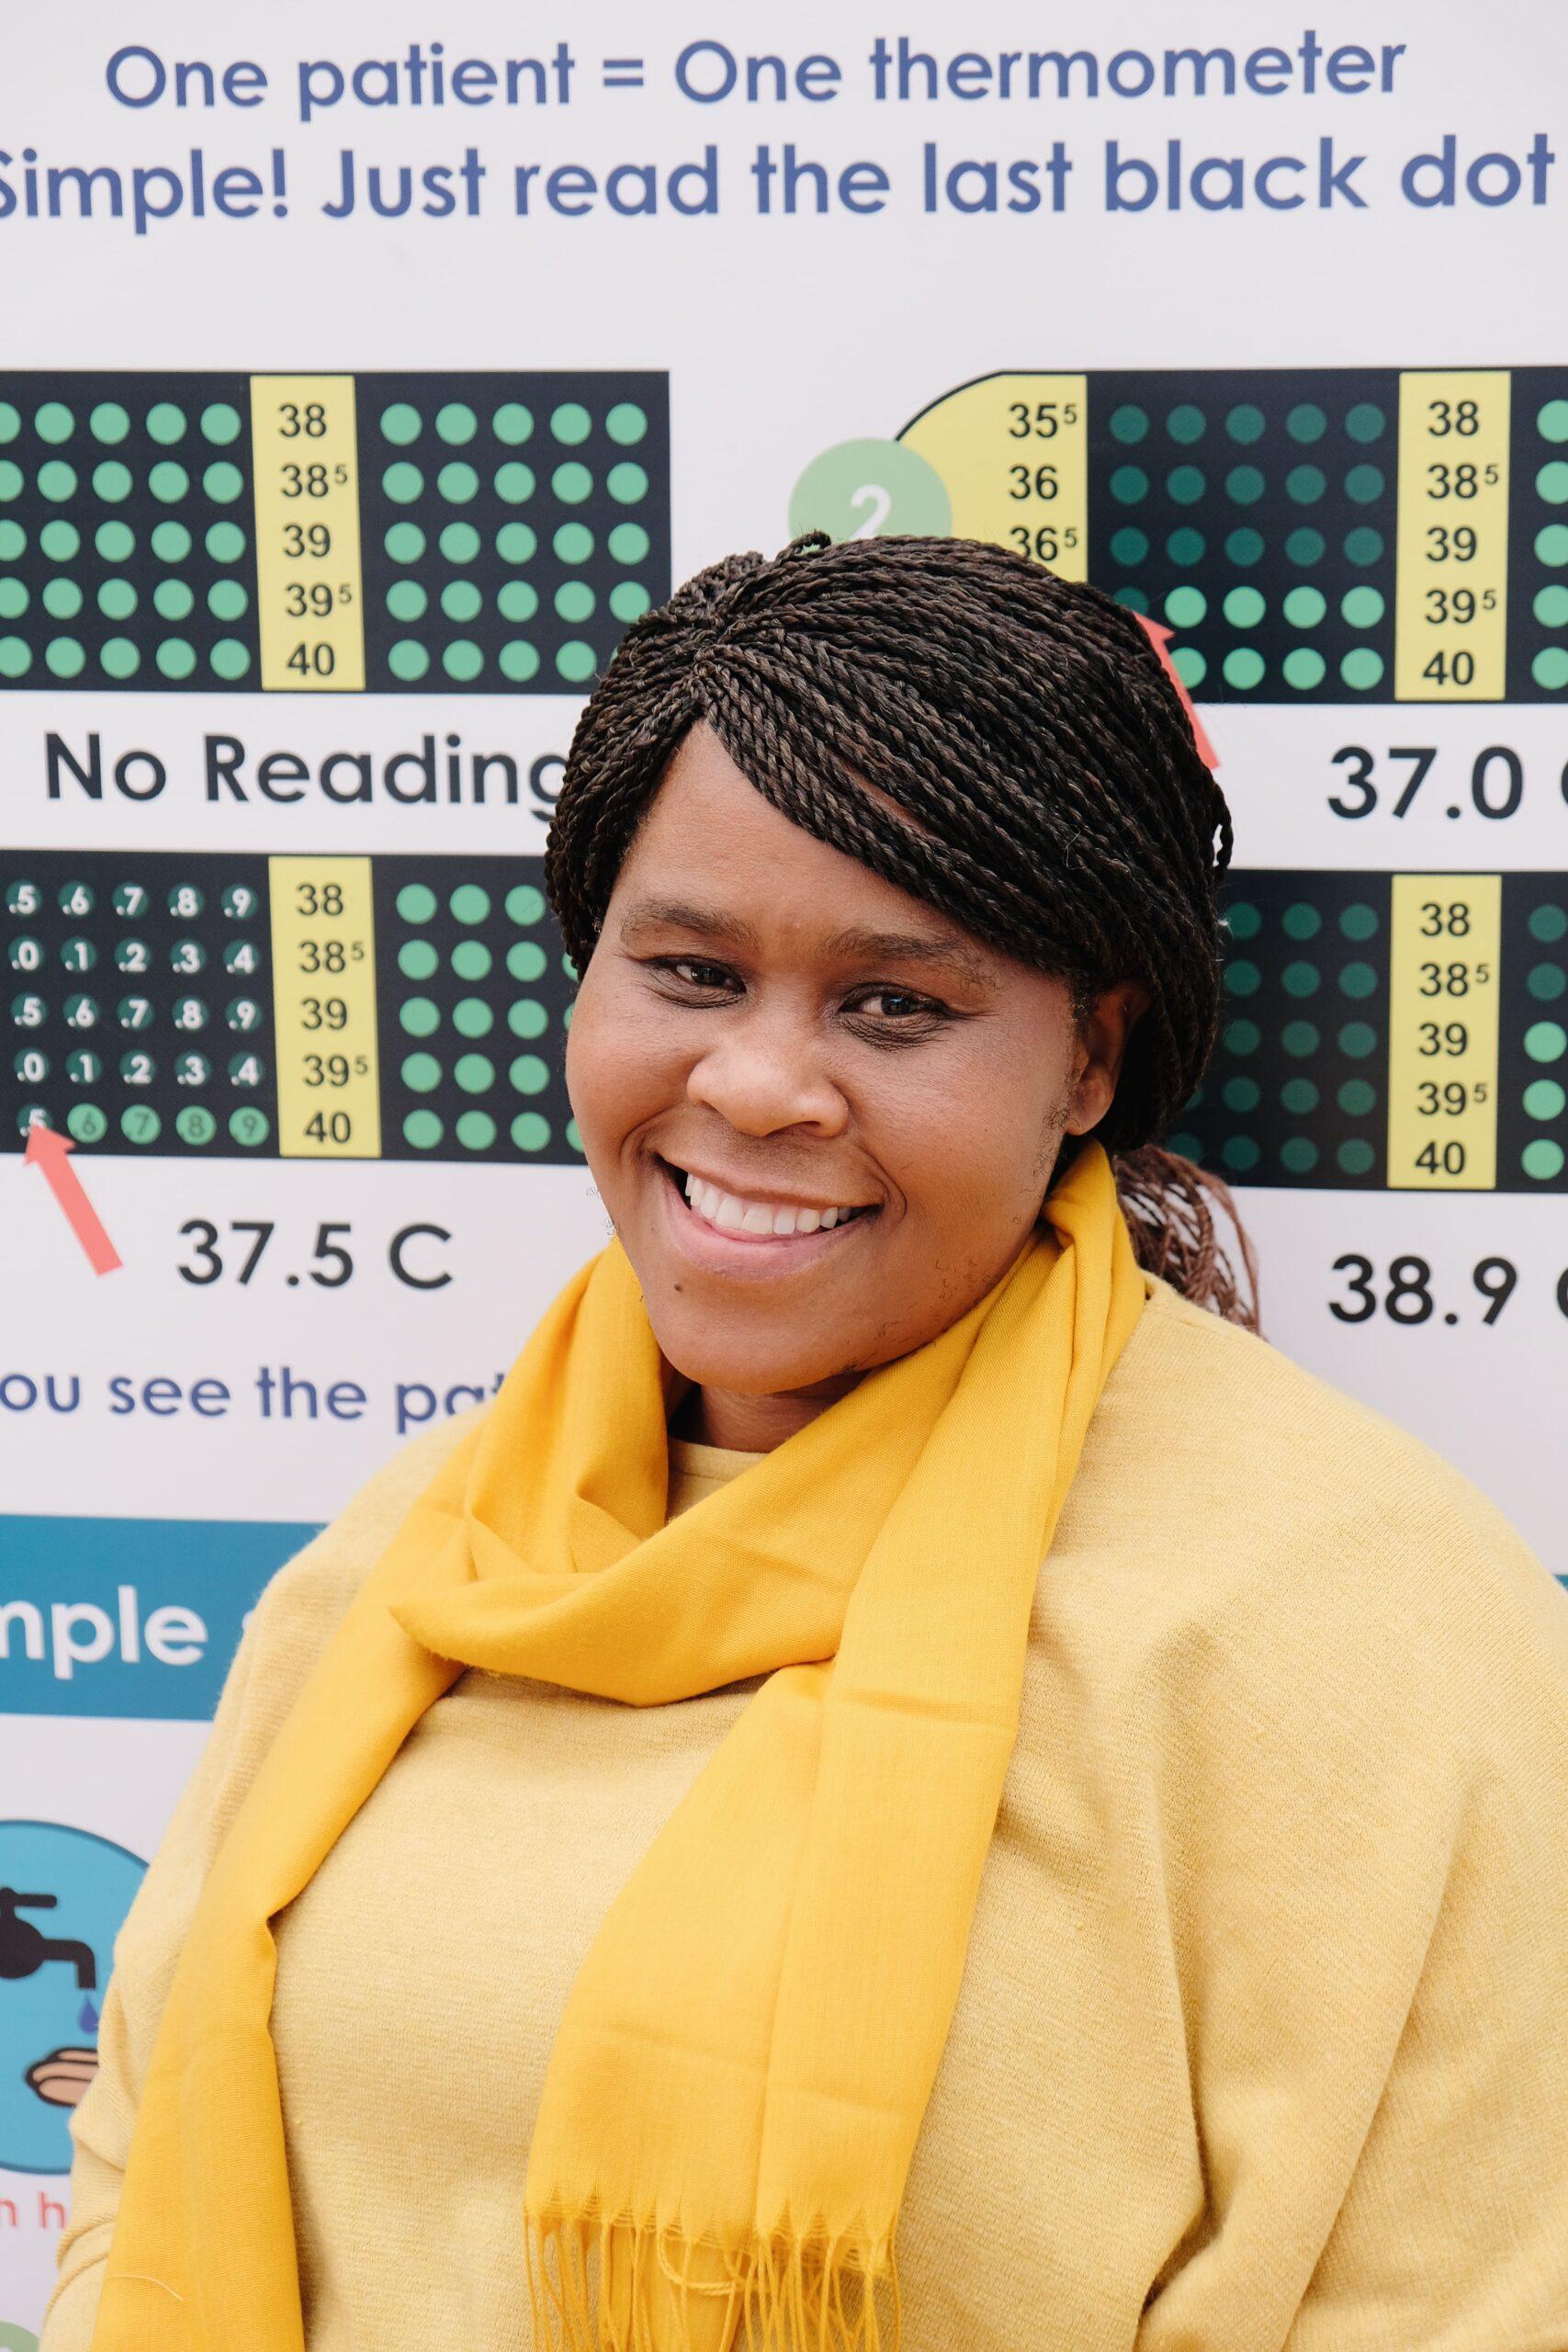 Cynthia Ngogela